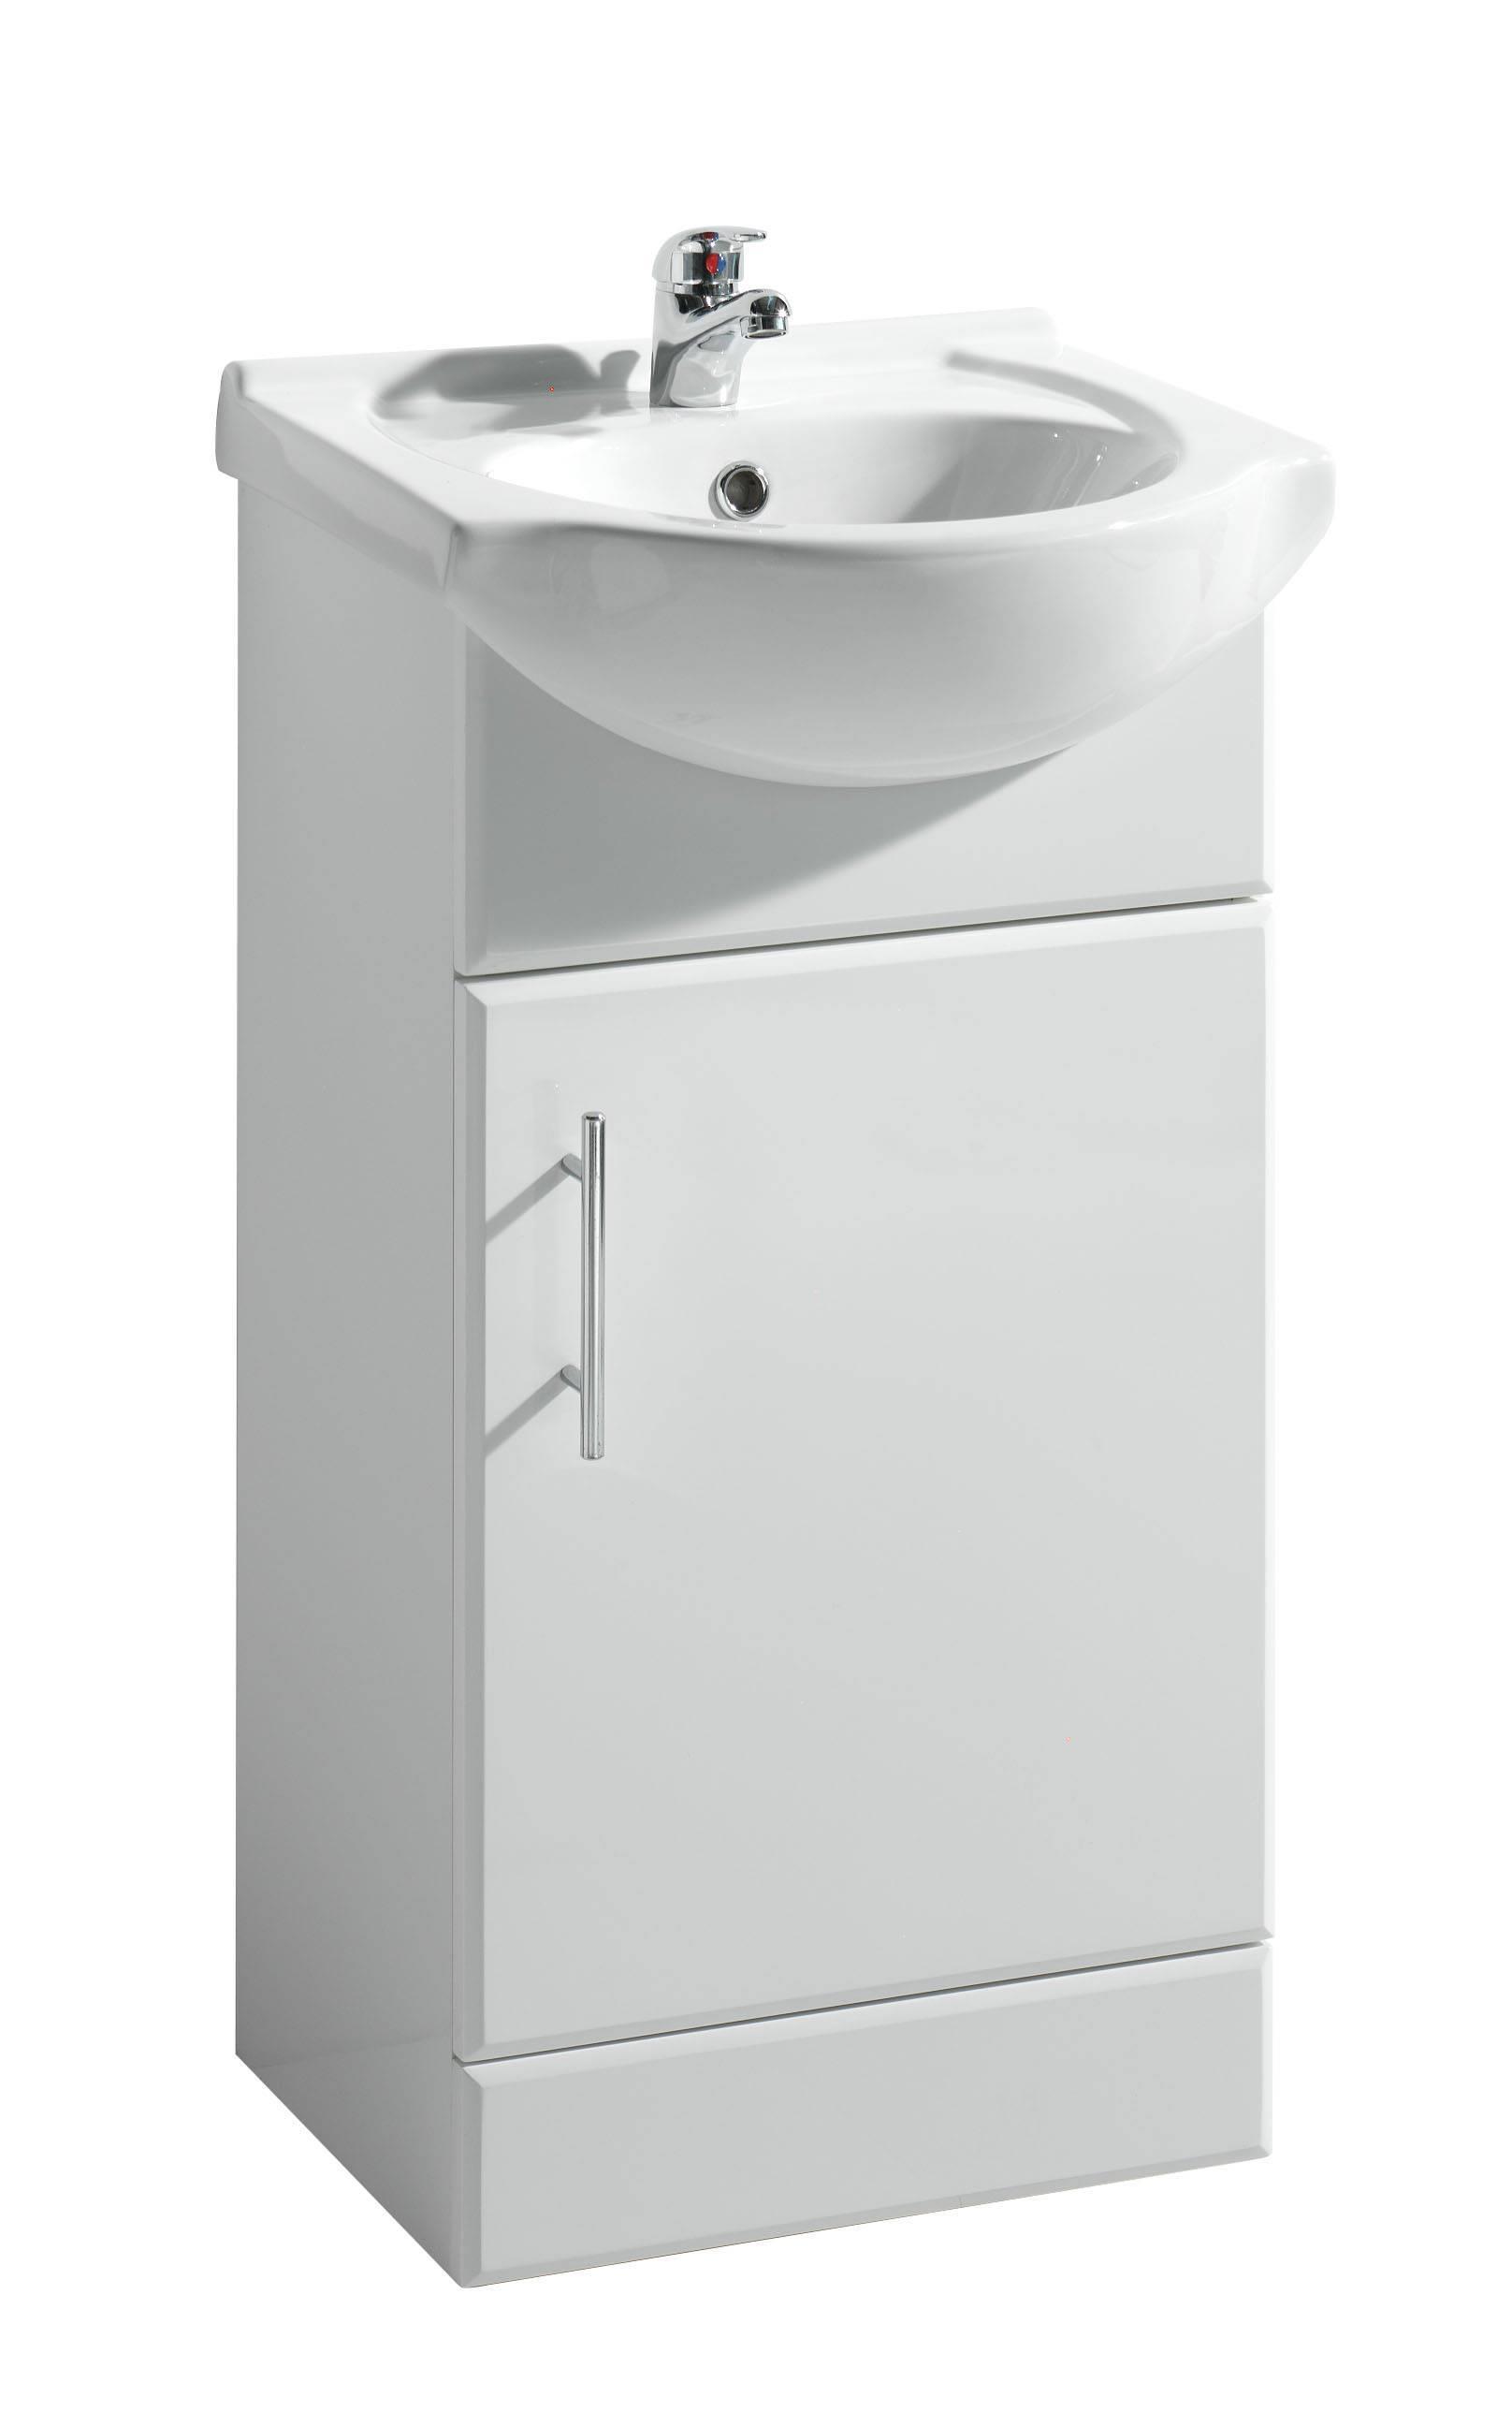 Cheap Bathroom Basins : Vanity With Basin with Wood Bathroom Wall Cabinets also Basin Bathroom ...